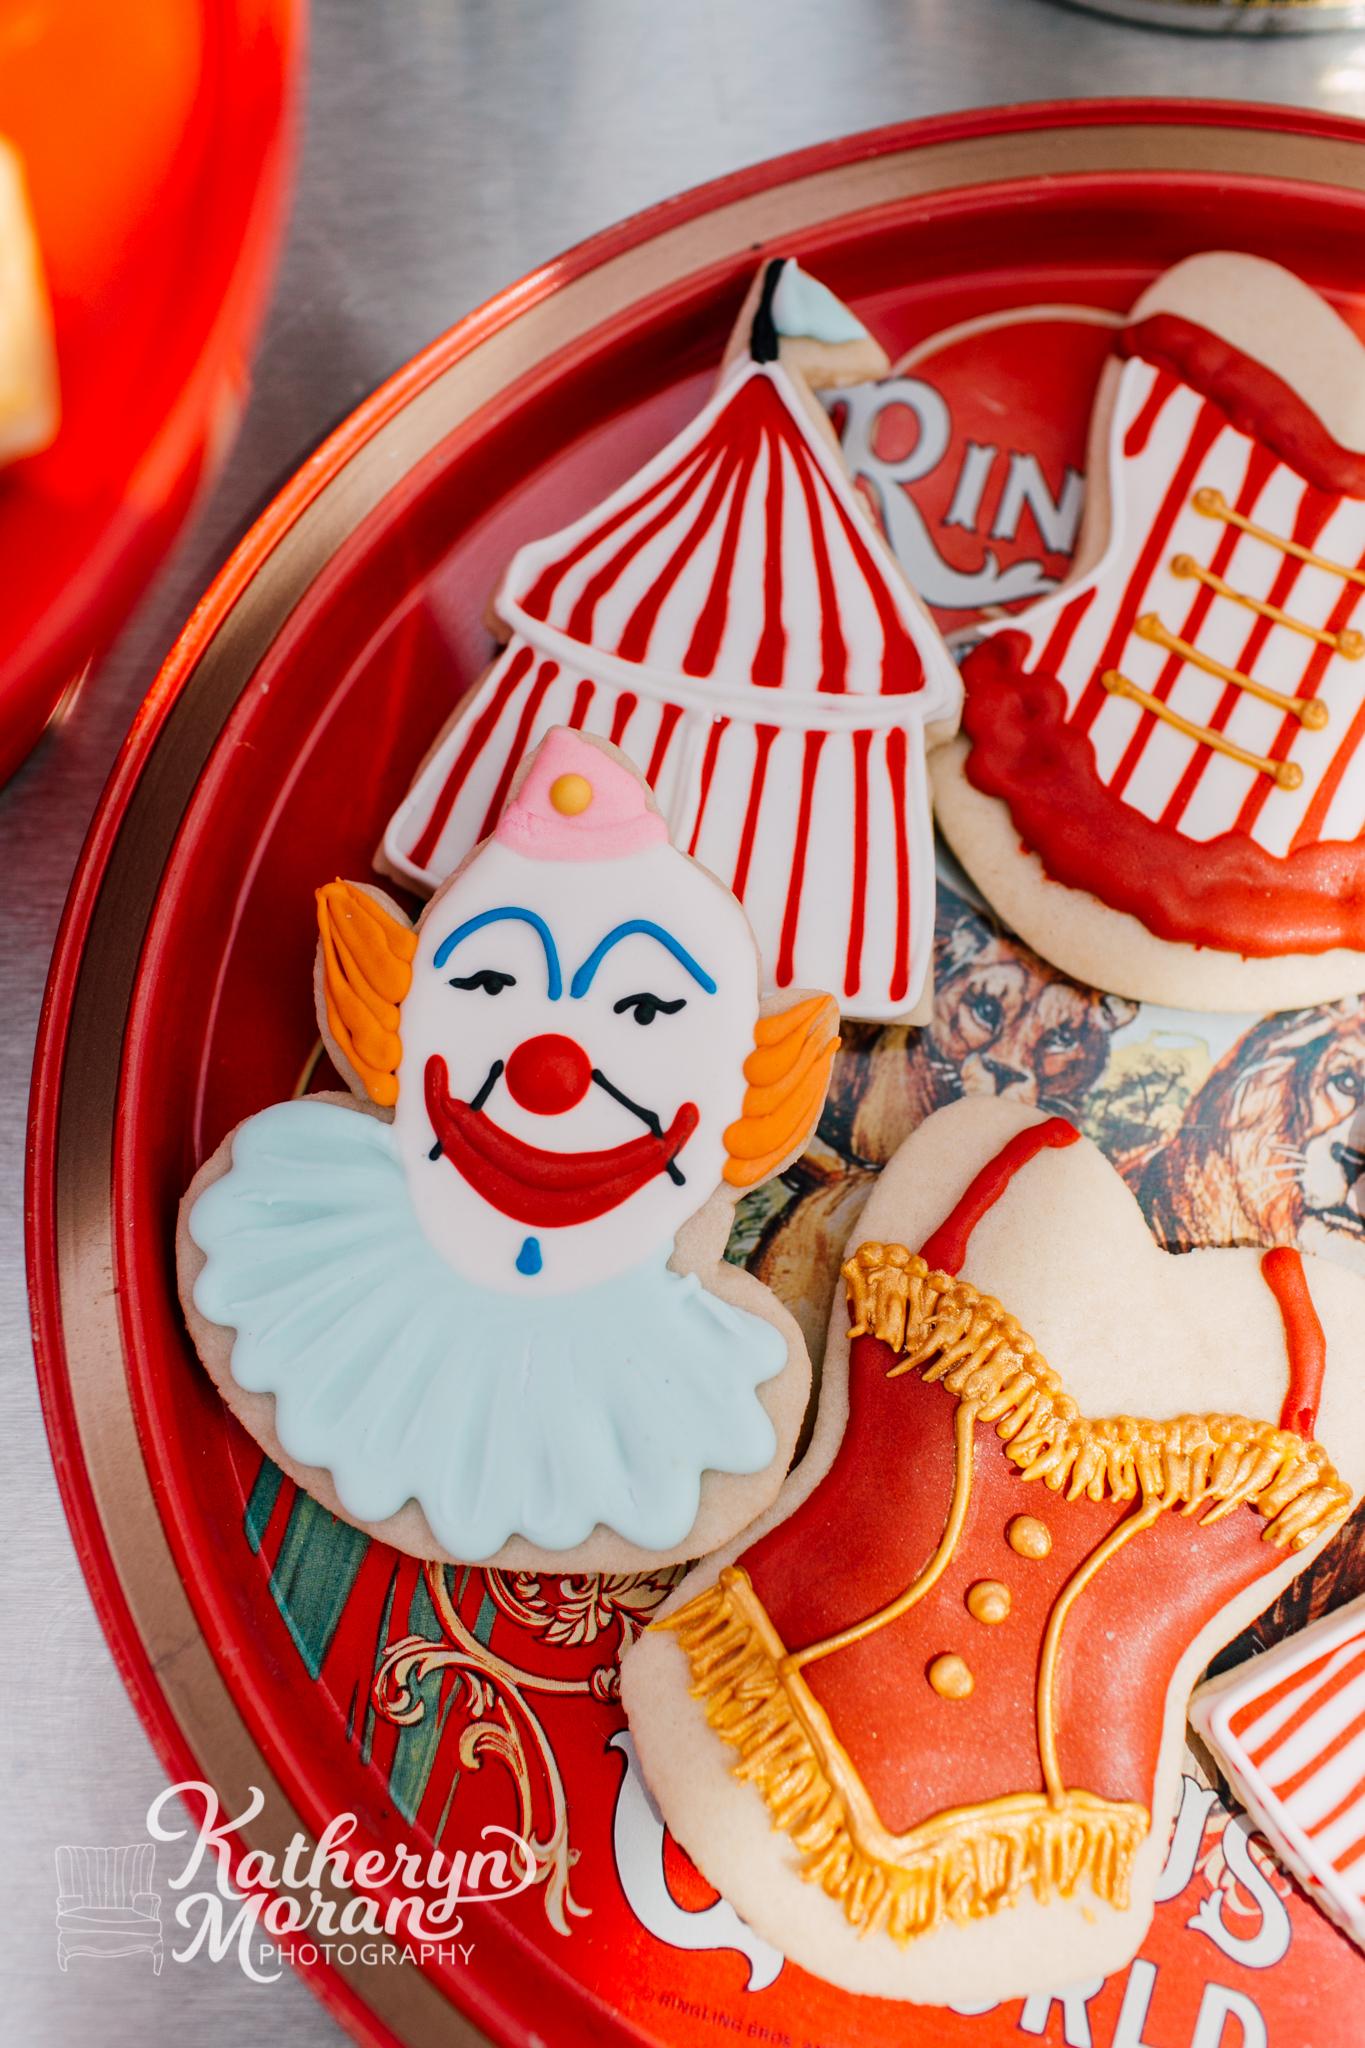 bellingham-seattle-event-photographer-vintage-circus-styled-katheryn-moran-84.jpg